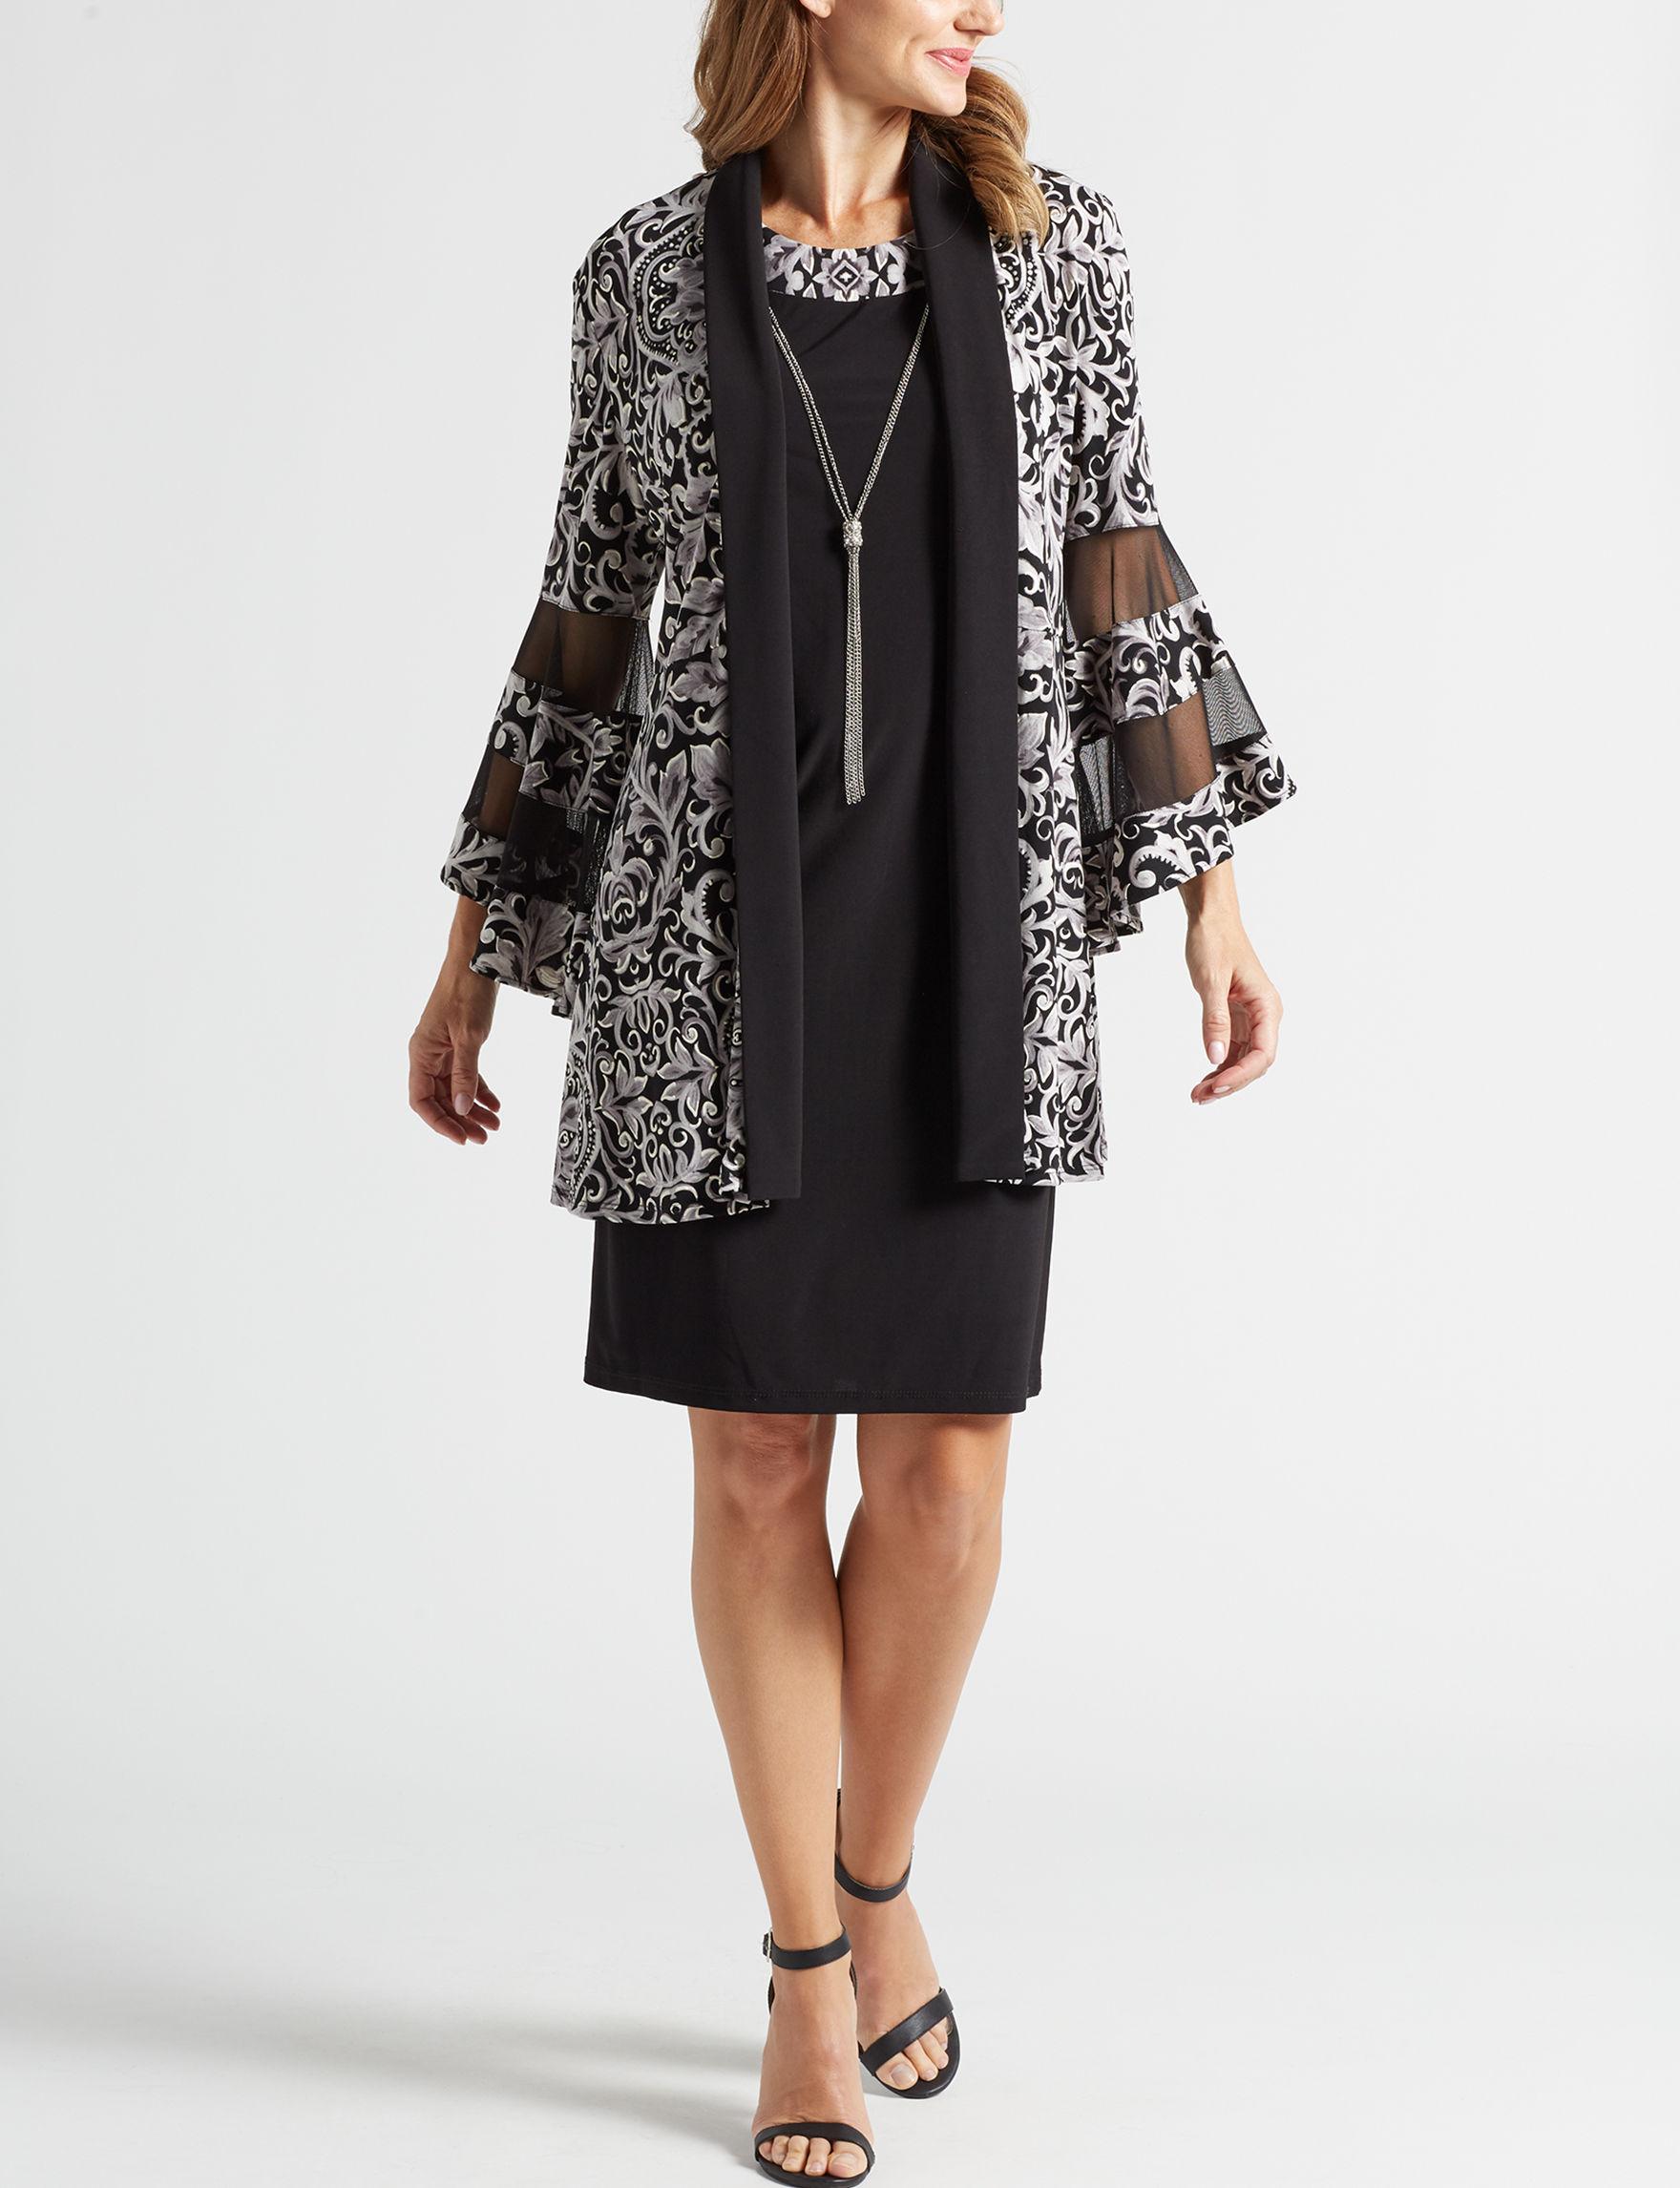 R & M Richards Black / Ivory Everyday & Casual Jacket Dresses